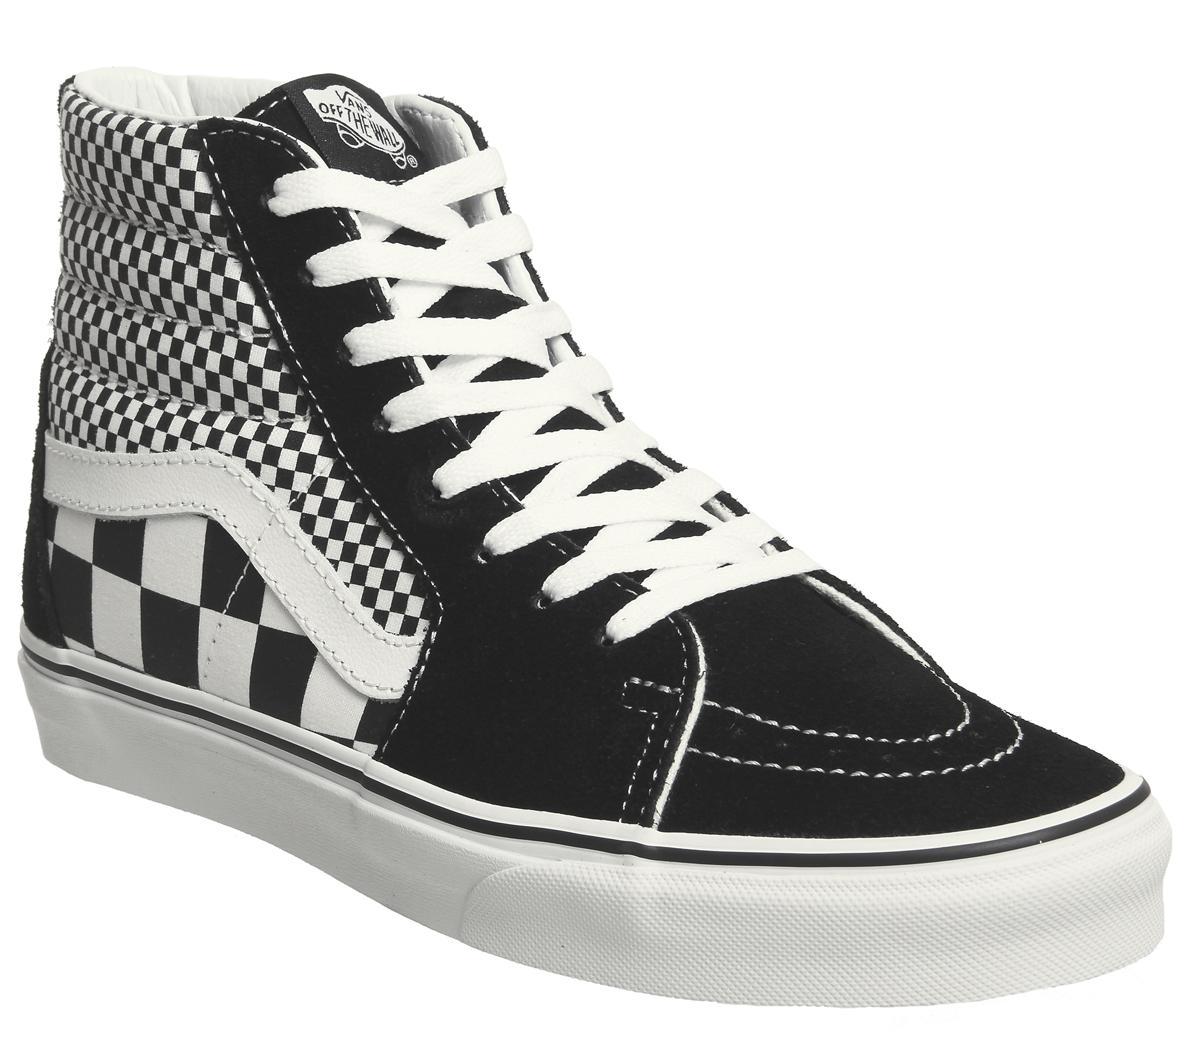 0b3a804119e1dc Vans Sk8 Hi Trainers Black White Mix Check - Unisex Sports